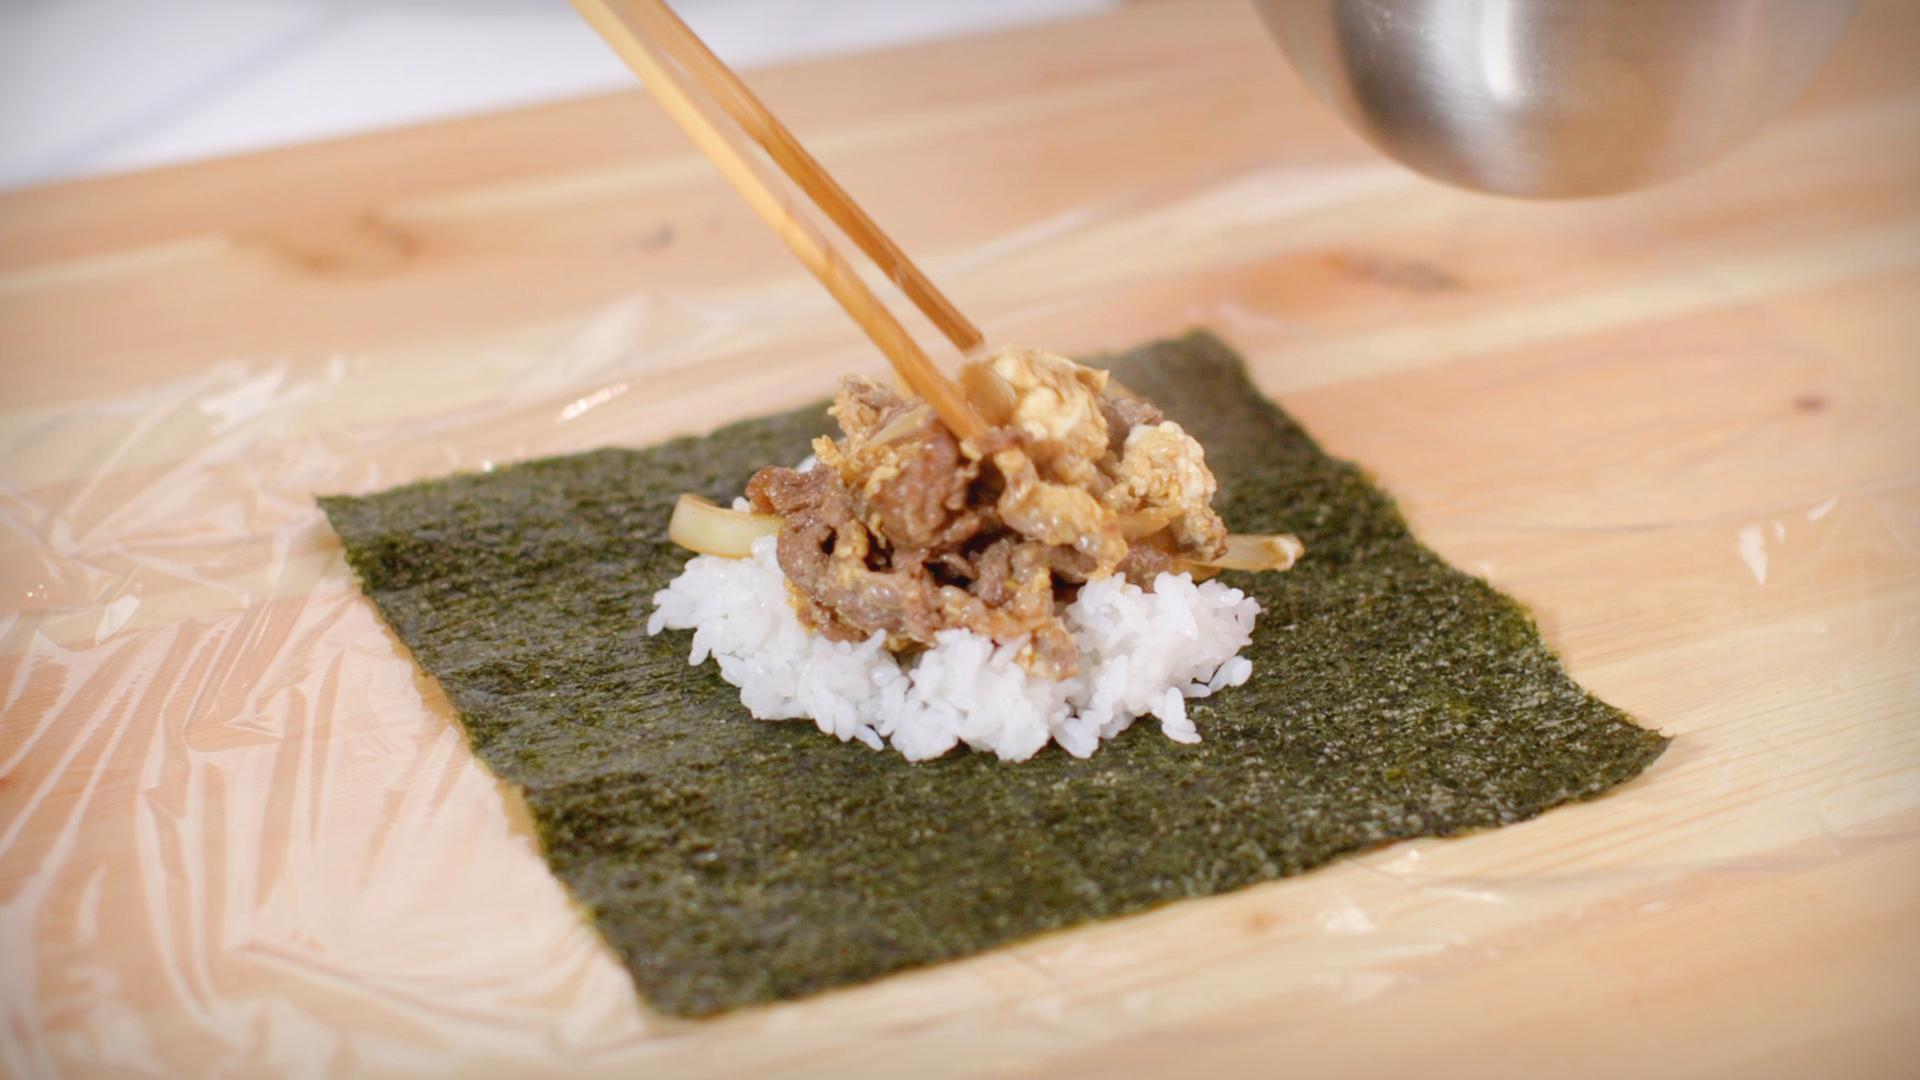 SUKIYAKI (BEEF, ONION & EGG)